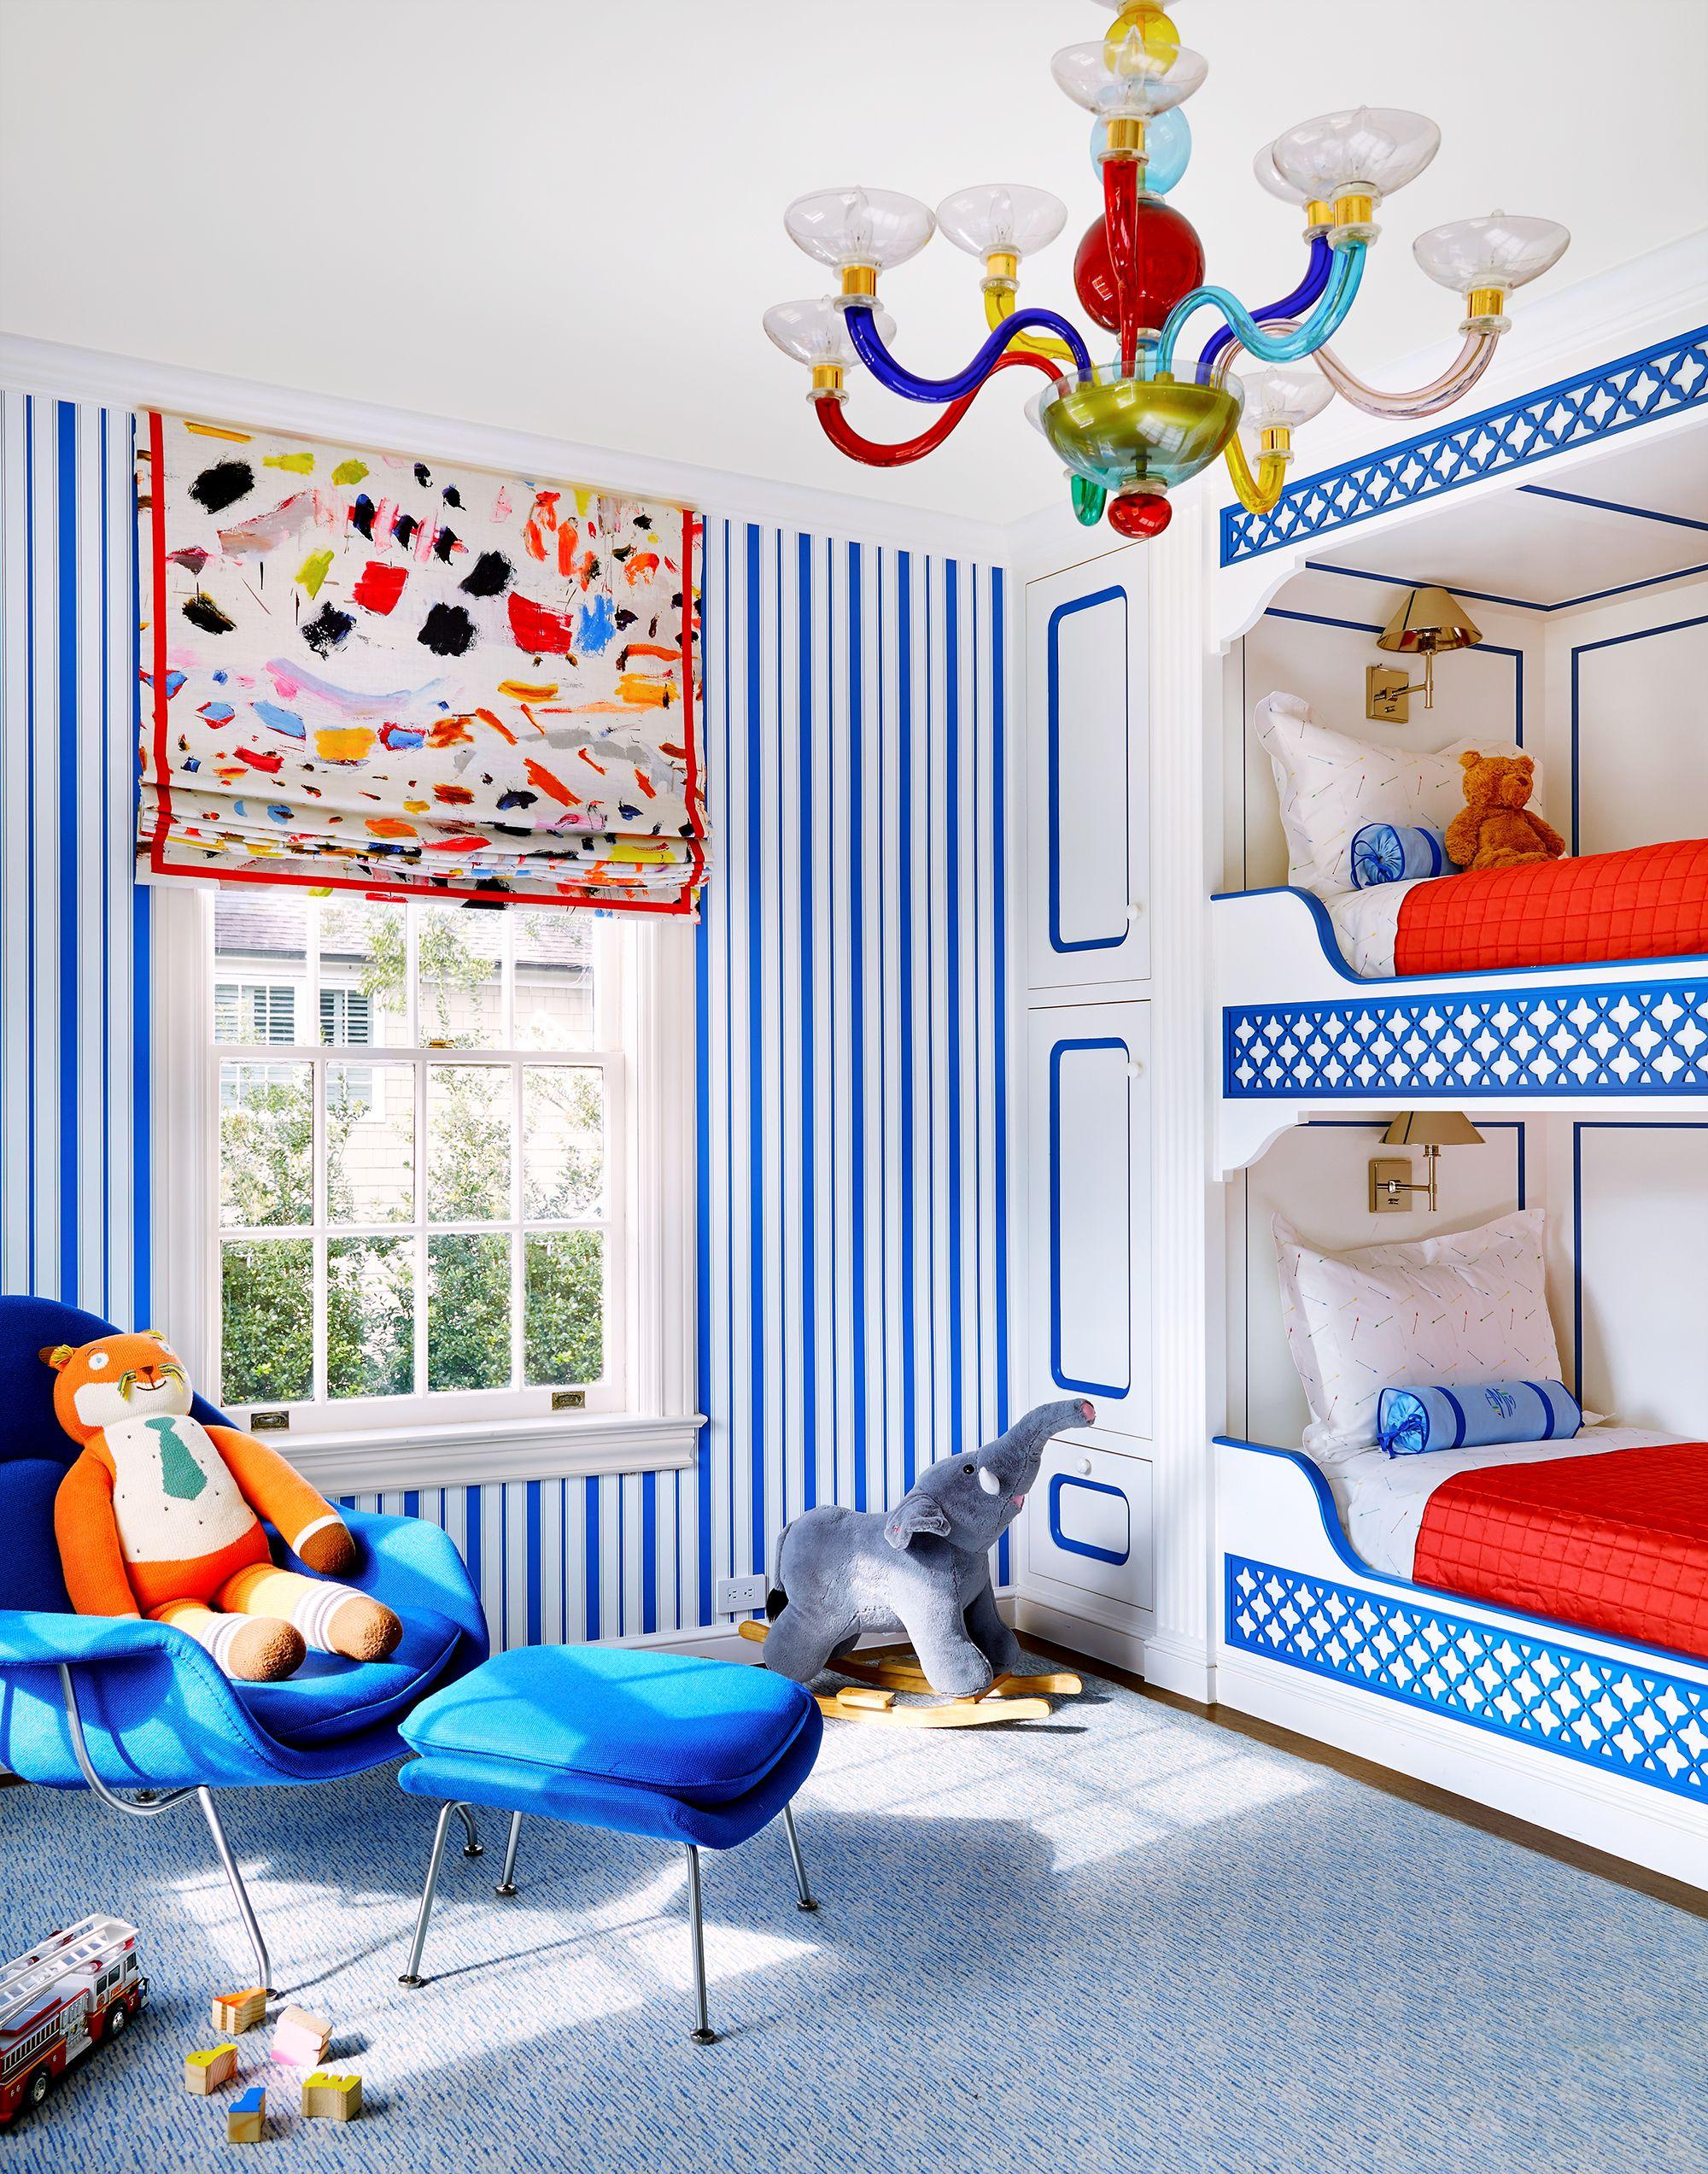 طراحی دکوراسیون اتاق خواب کودک